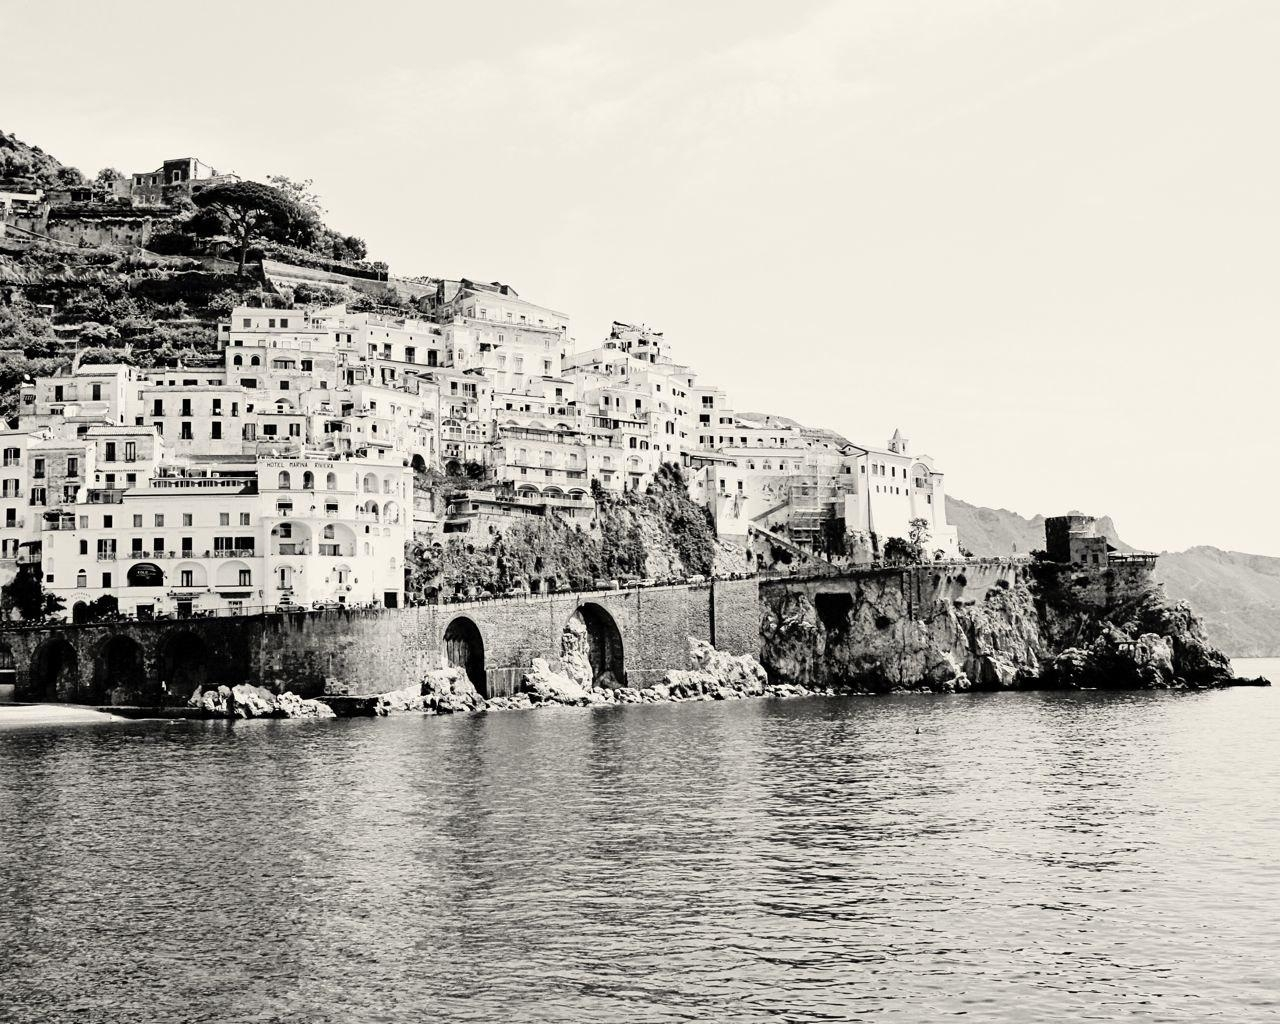 Amalfi Photography Black And White Italy Photography Inside Black And White Italian Wall Art (View 3 of 20)